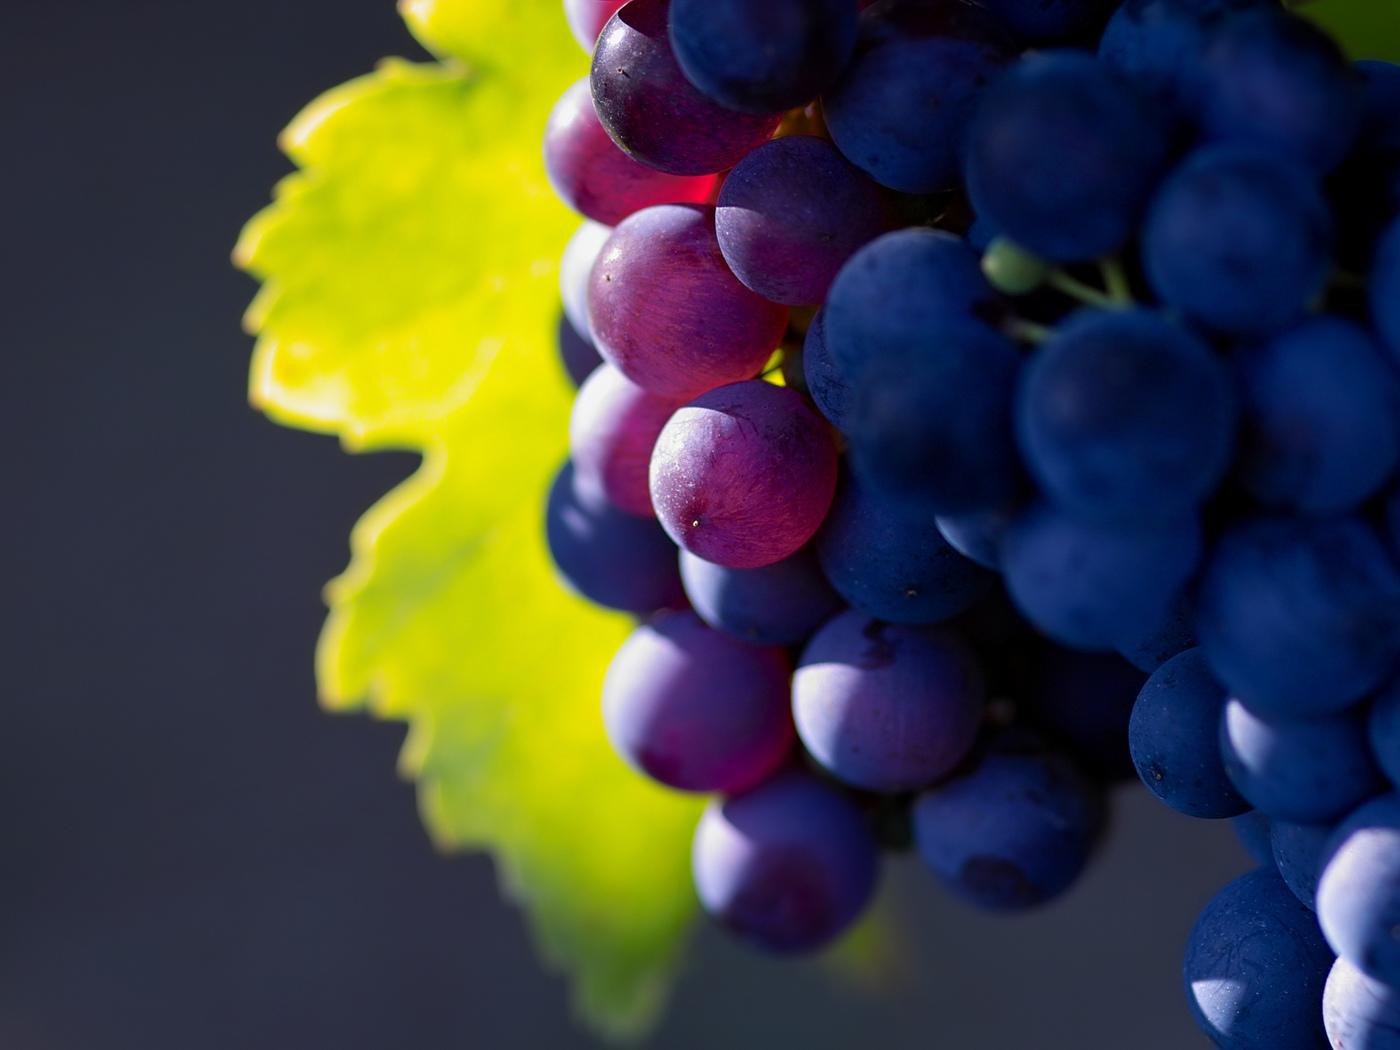 macro photo, grape, фото, фрукты, виноград, nature wallpapers, Макро обои, fruit, природа, большое разрешение